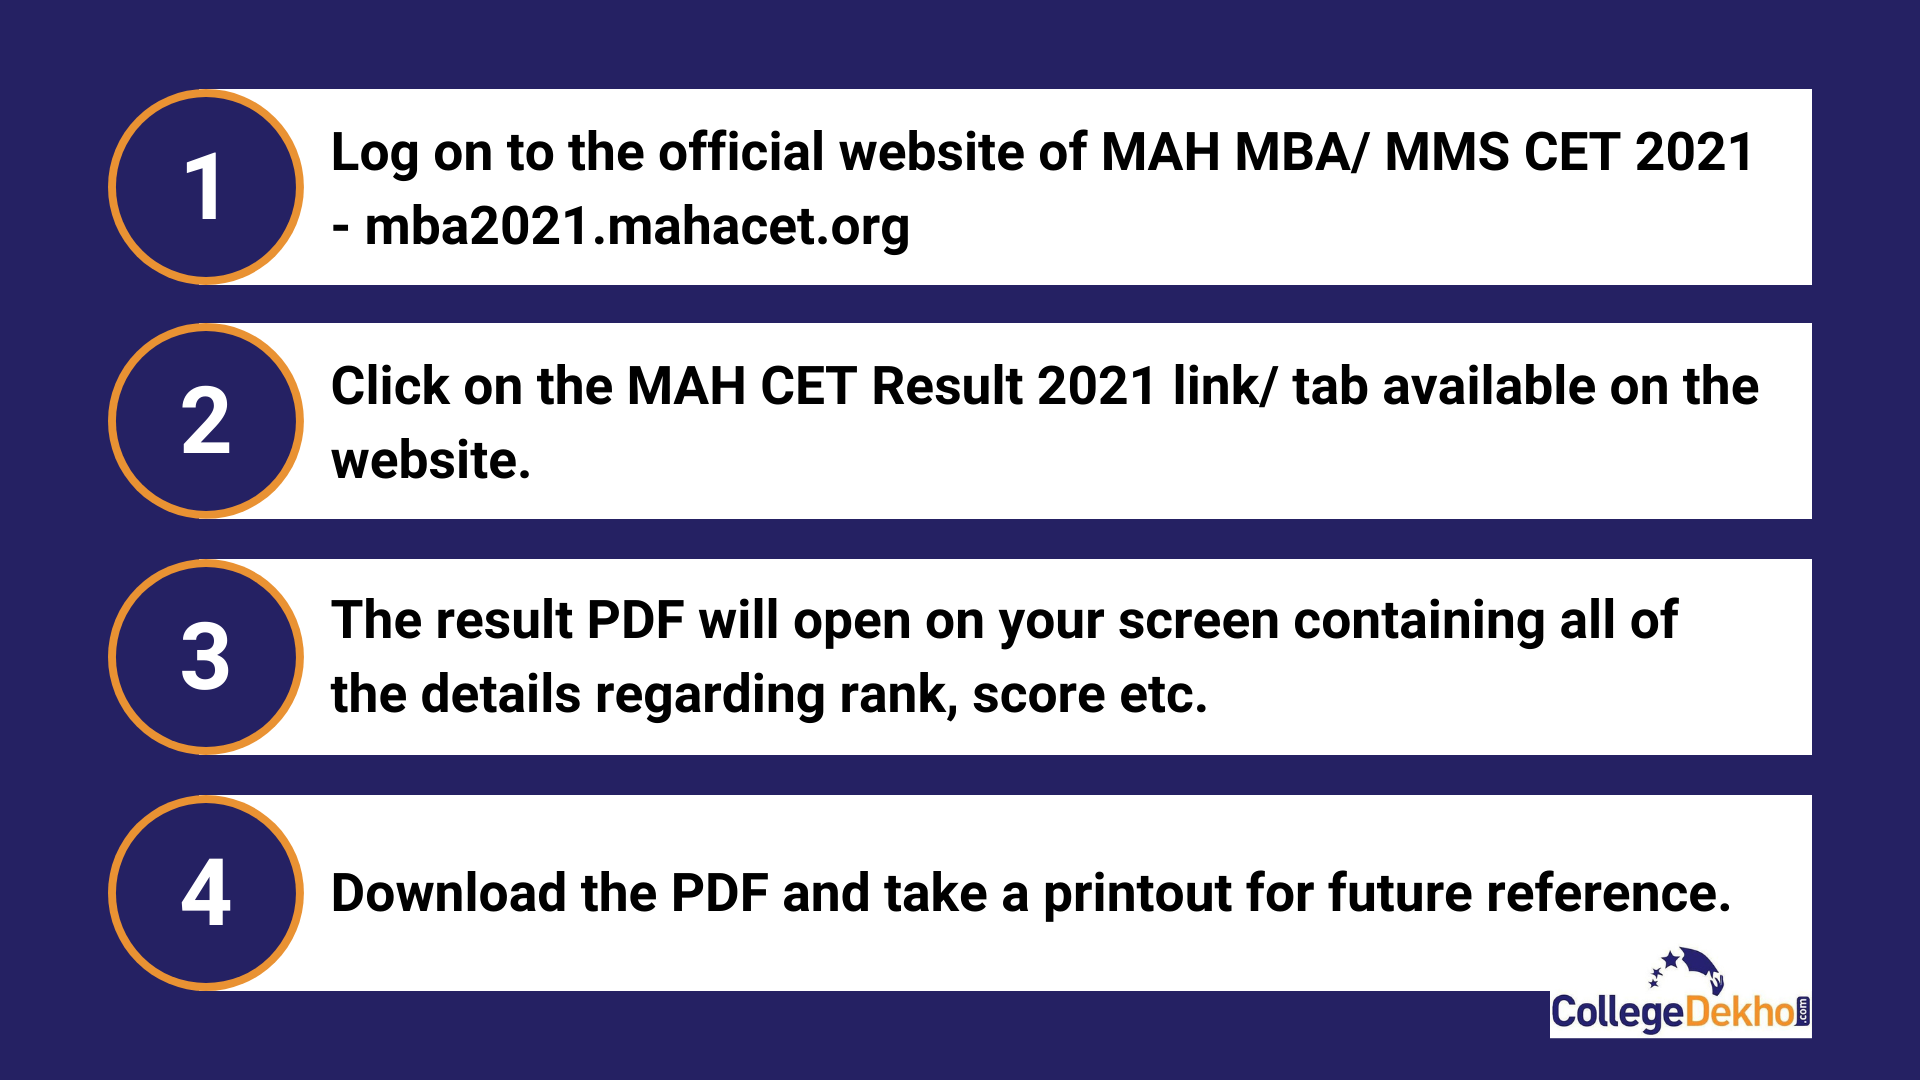 Steps to Check MAH CET Result 2021